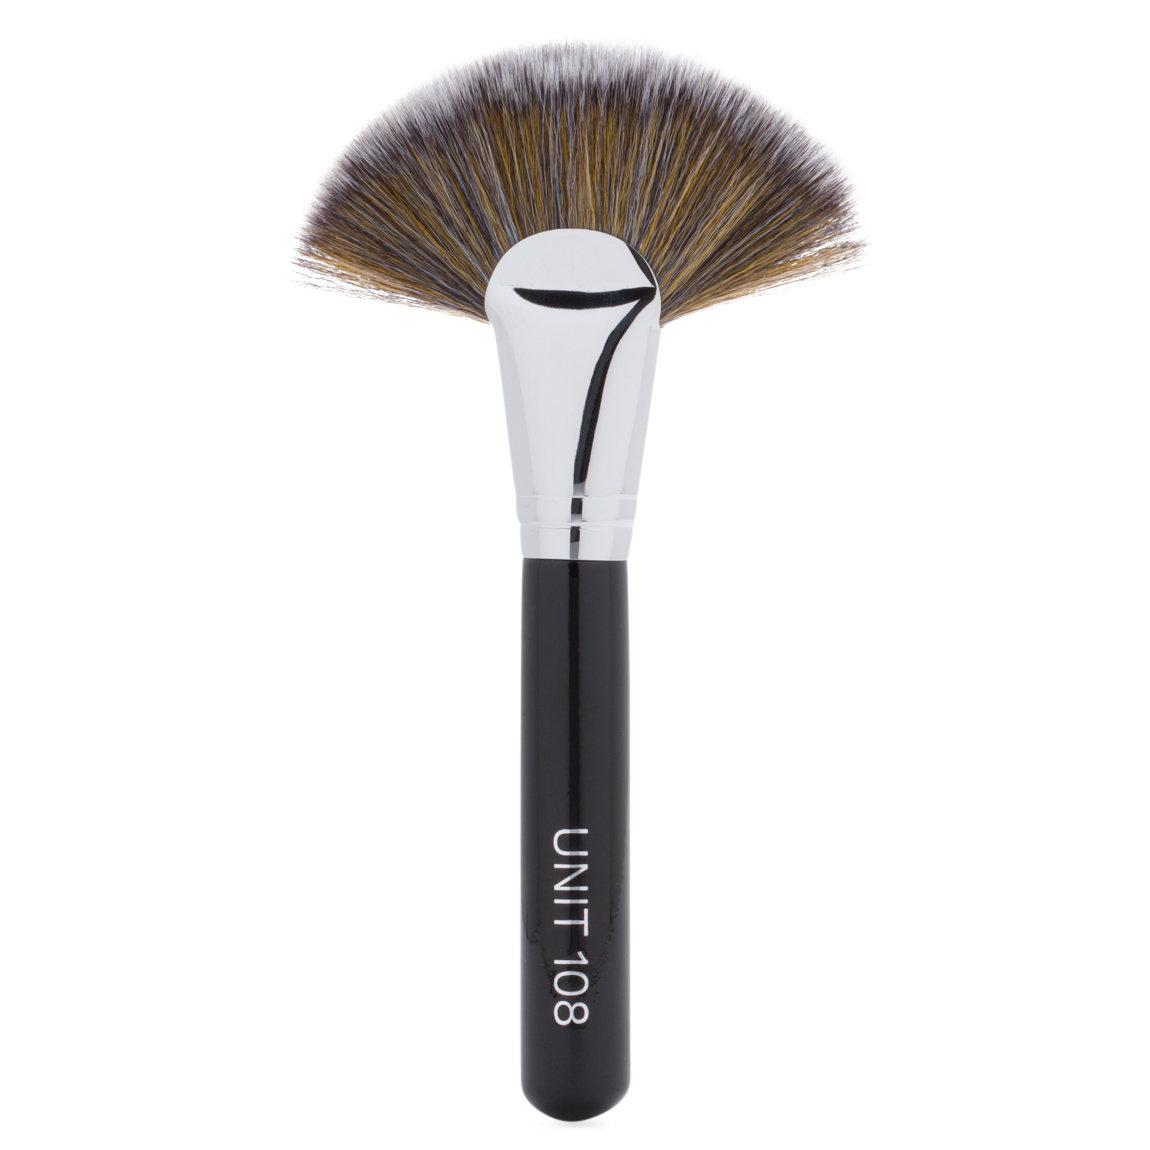 UNIT 108 Cheek Brush